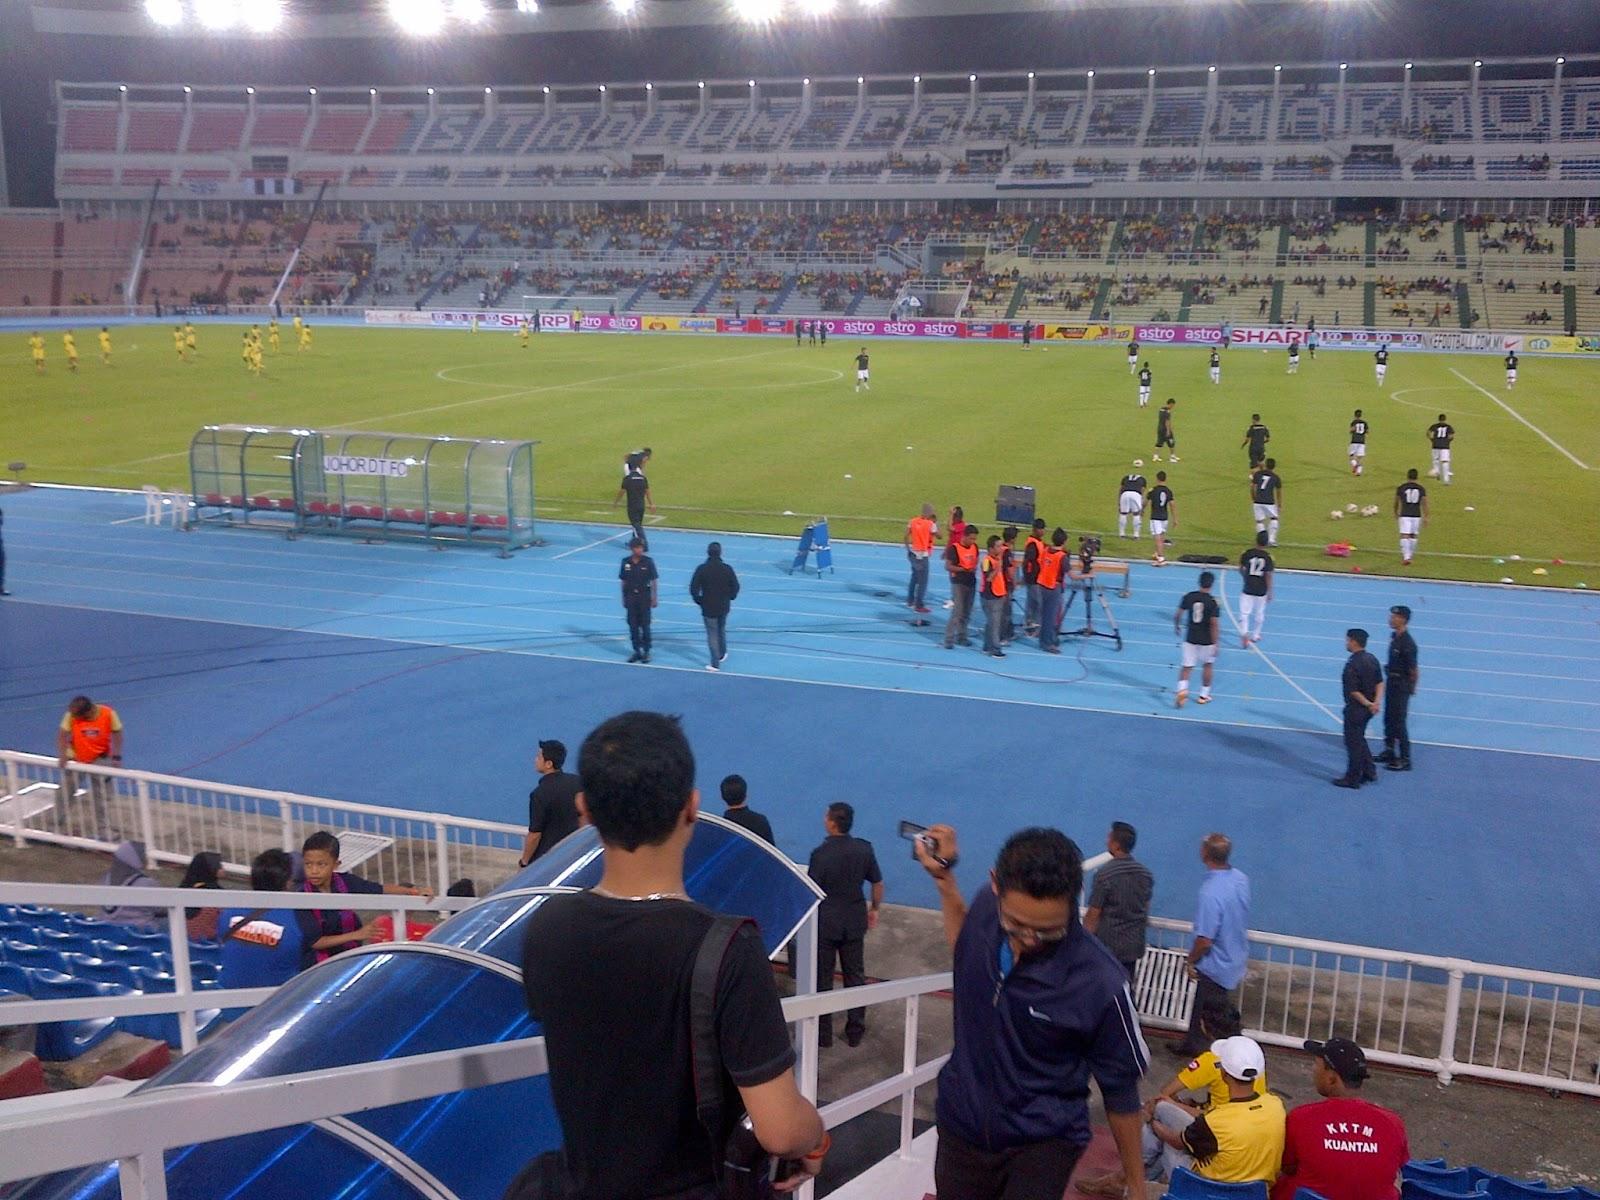 http://3.bp.blogspot.com/-0SE9zeAua-4/UO57Vqh1D0I/AAAAAAAADOc/IKzJxhwzhb8/s1600/Liga+Super+-+Pahang+vs+Johor+Darul+Takzim+FC1.jpg